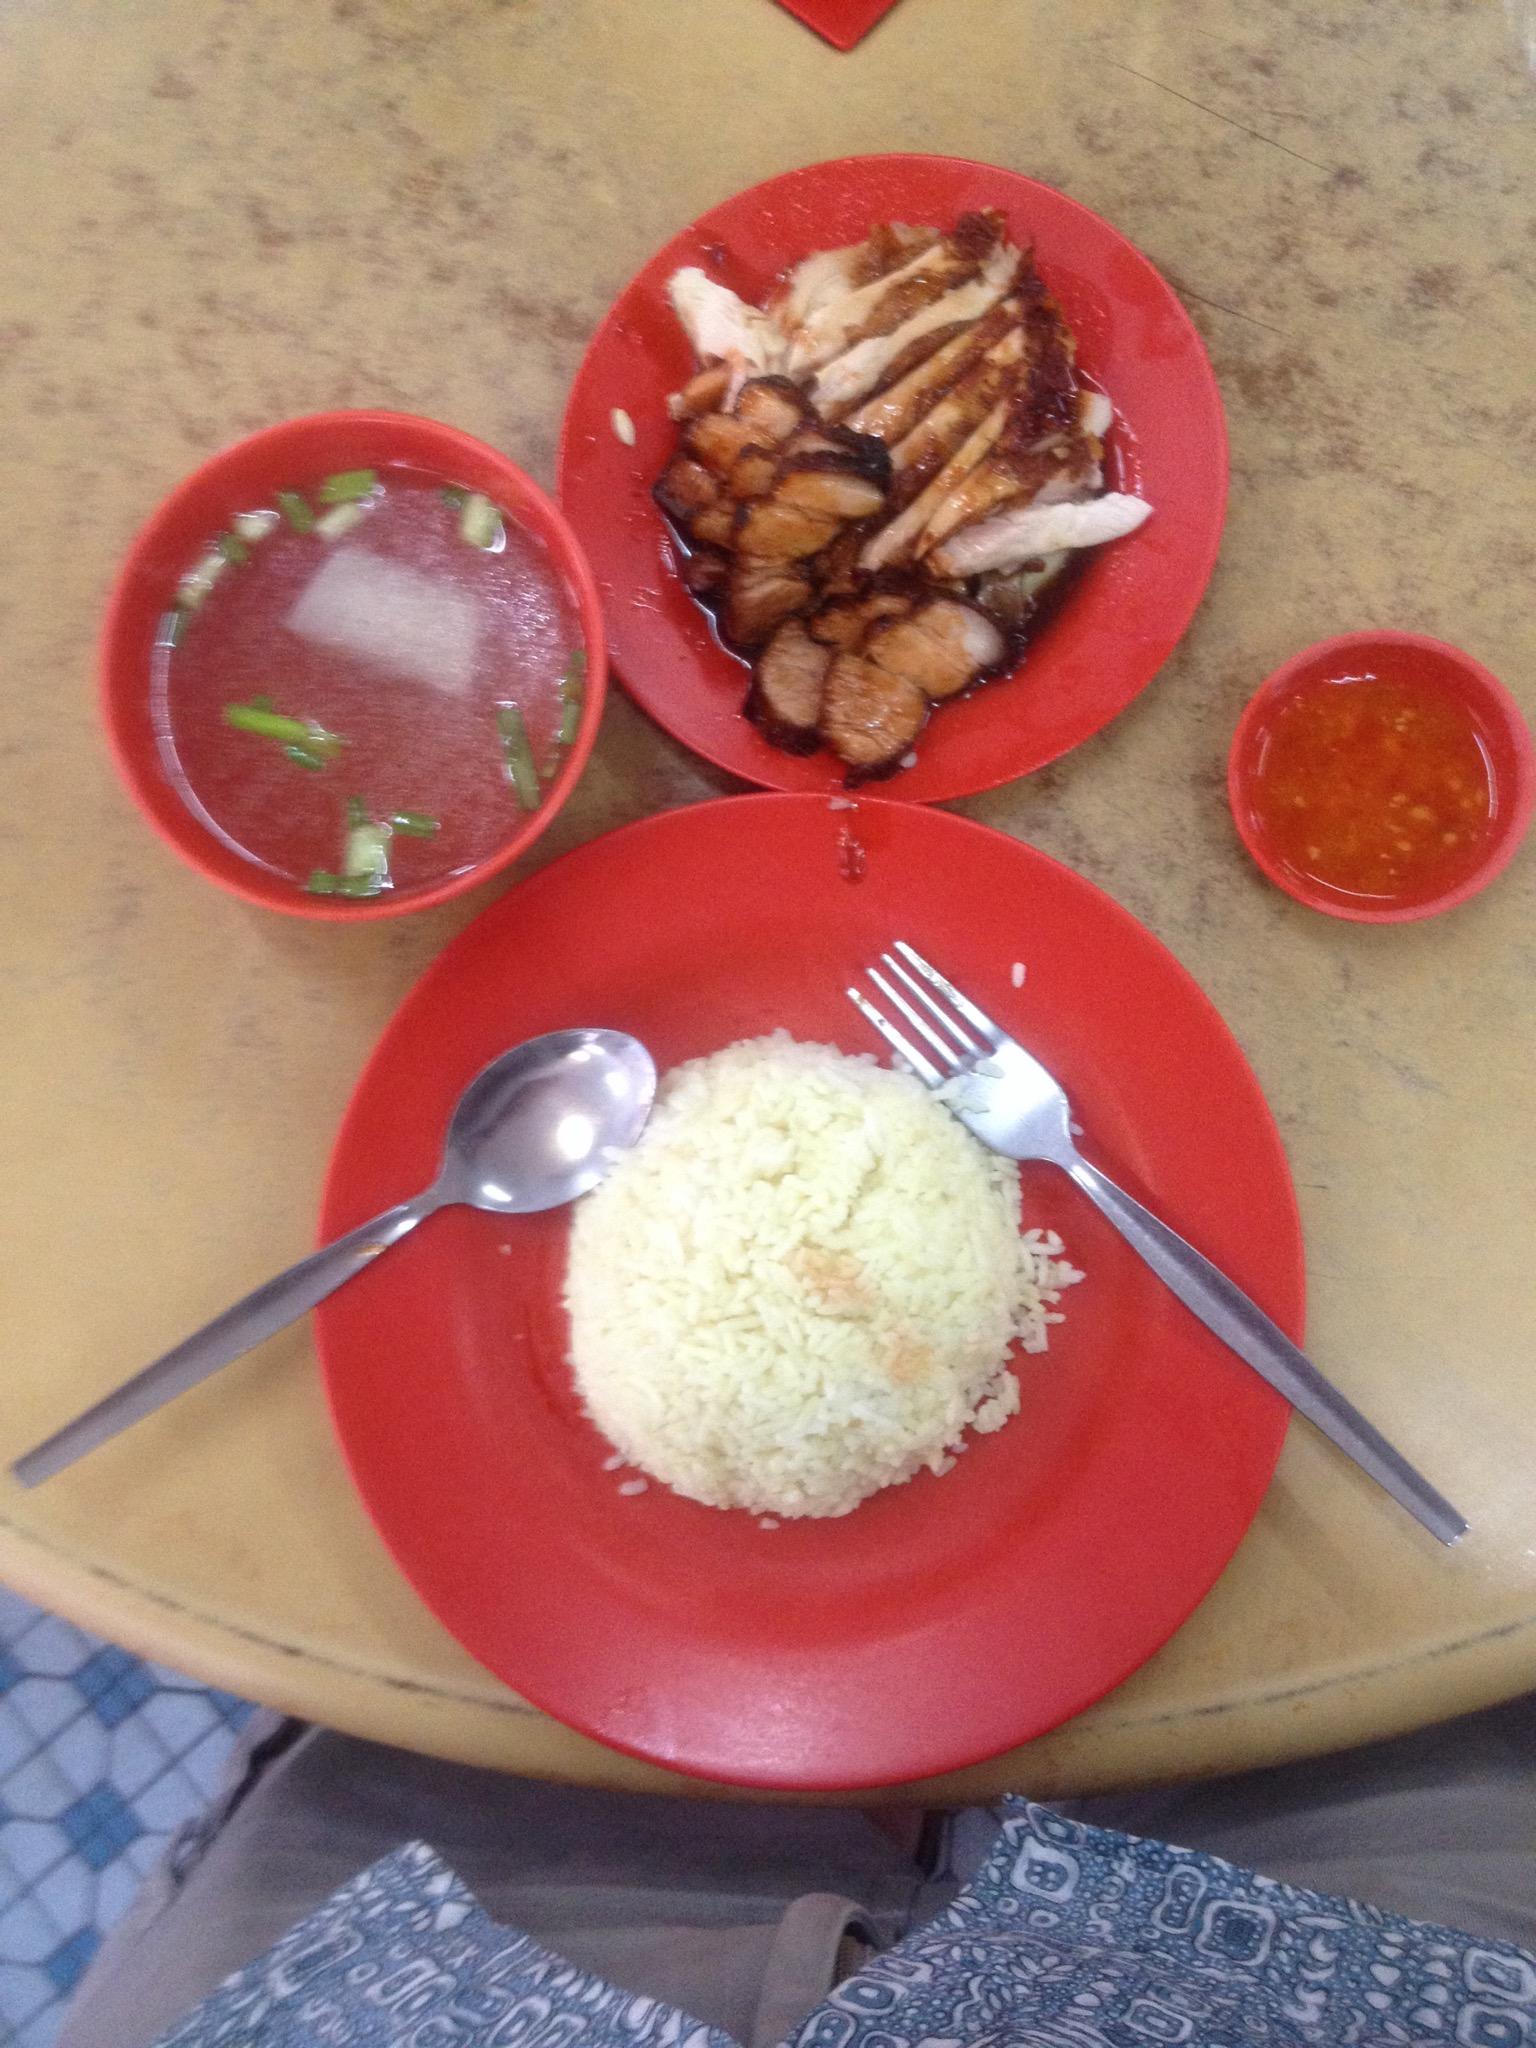 Best chicken rice across the road